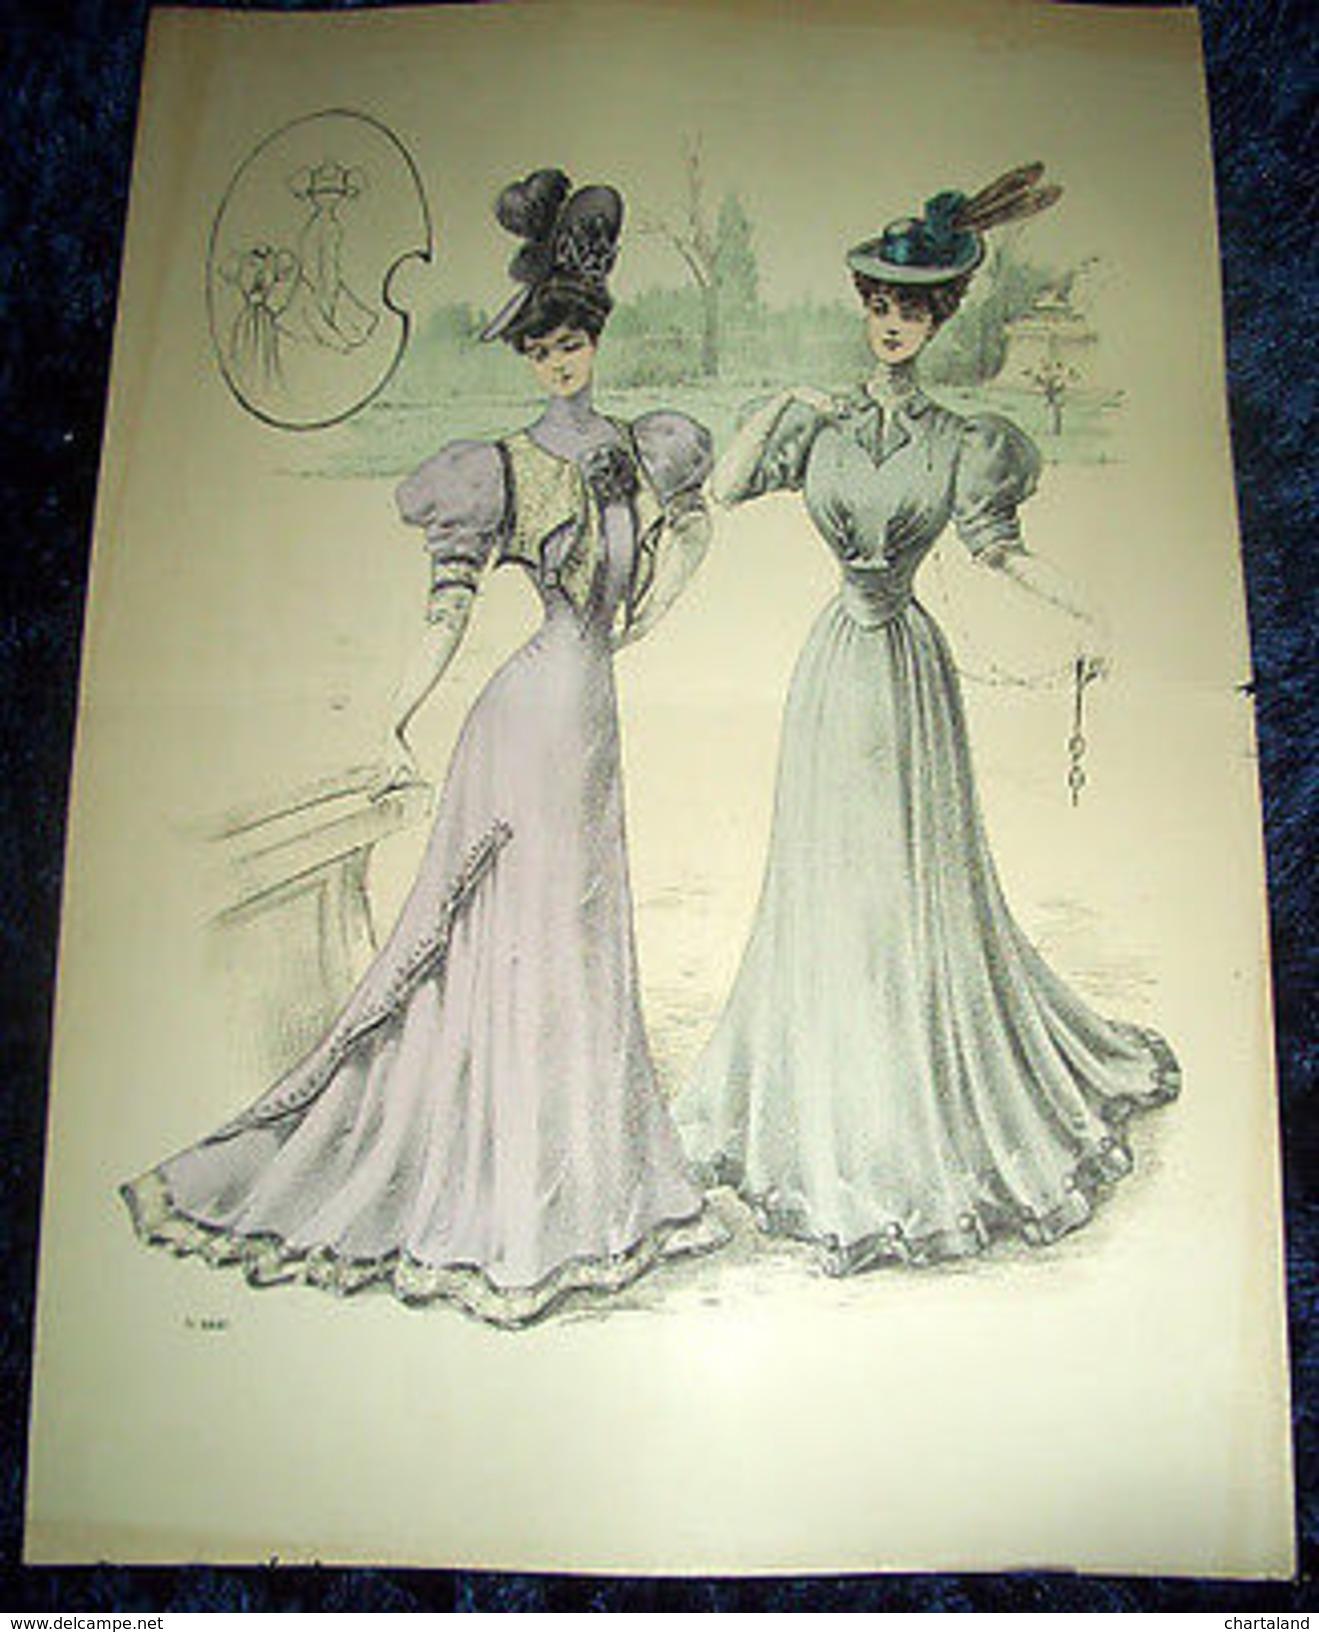 Stampa Litografia D' Epoca Originale - Moda Abiti Donna C74 - 1900 Ca - Stampe & Incisioni